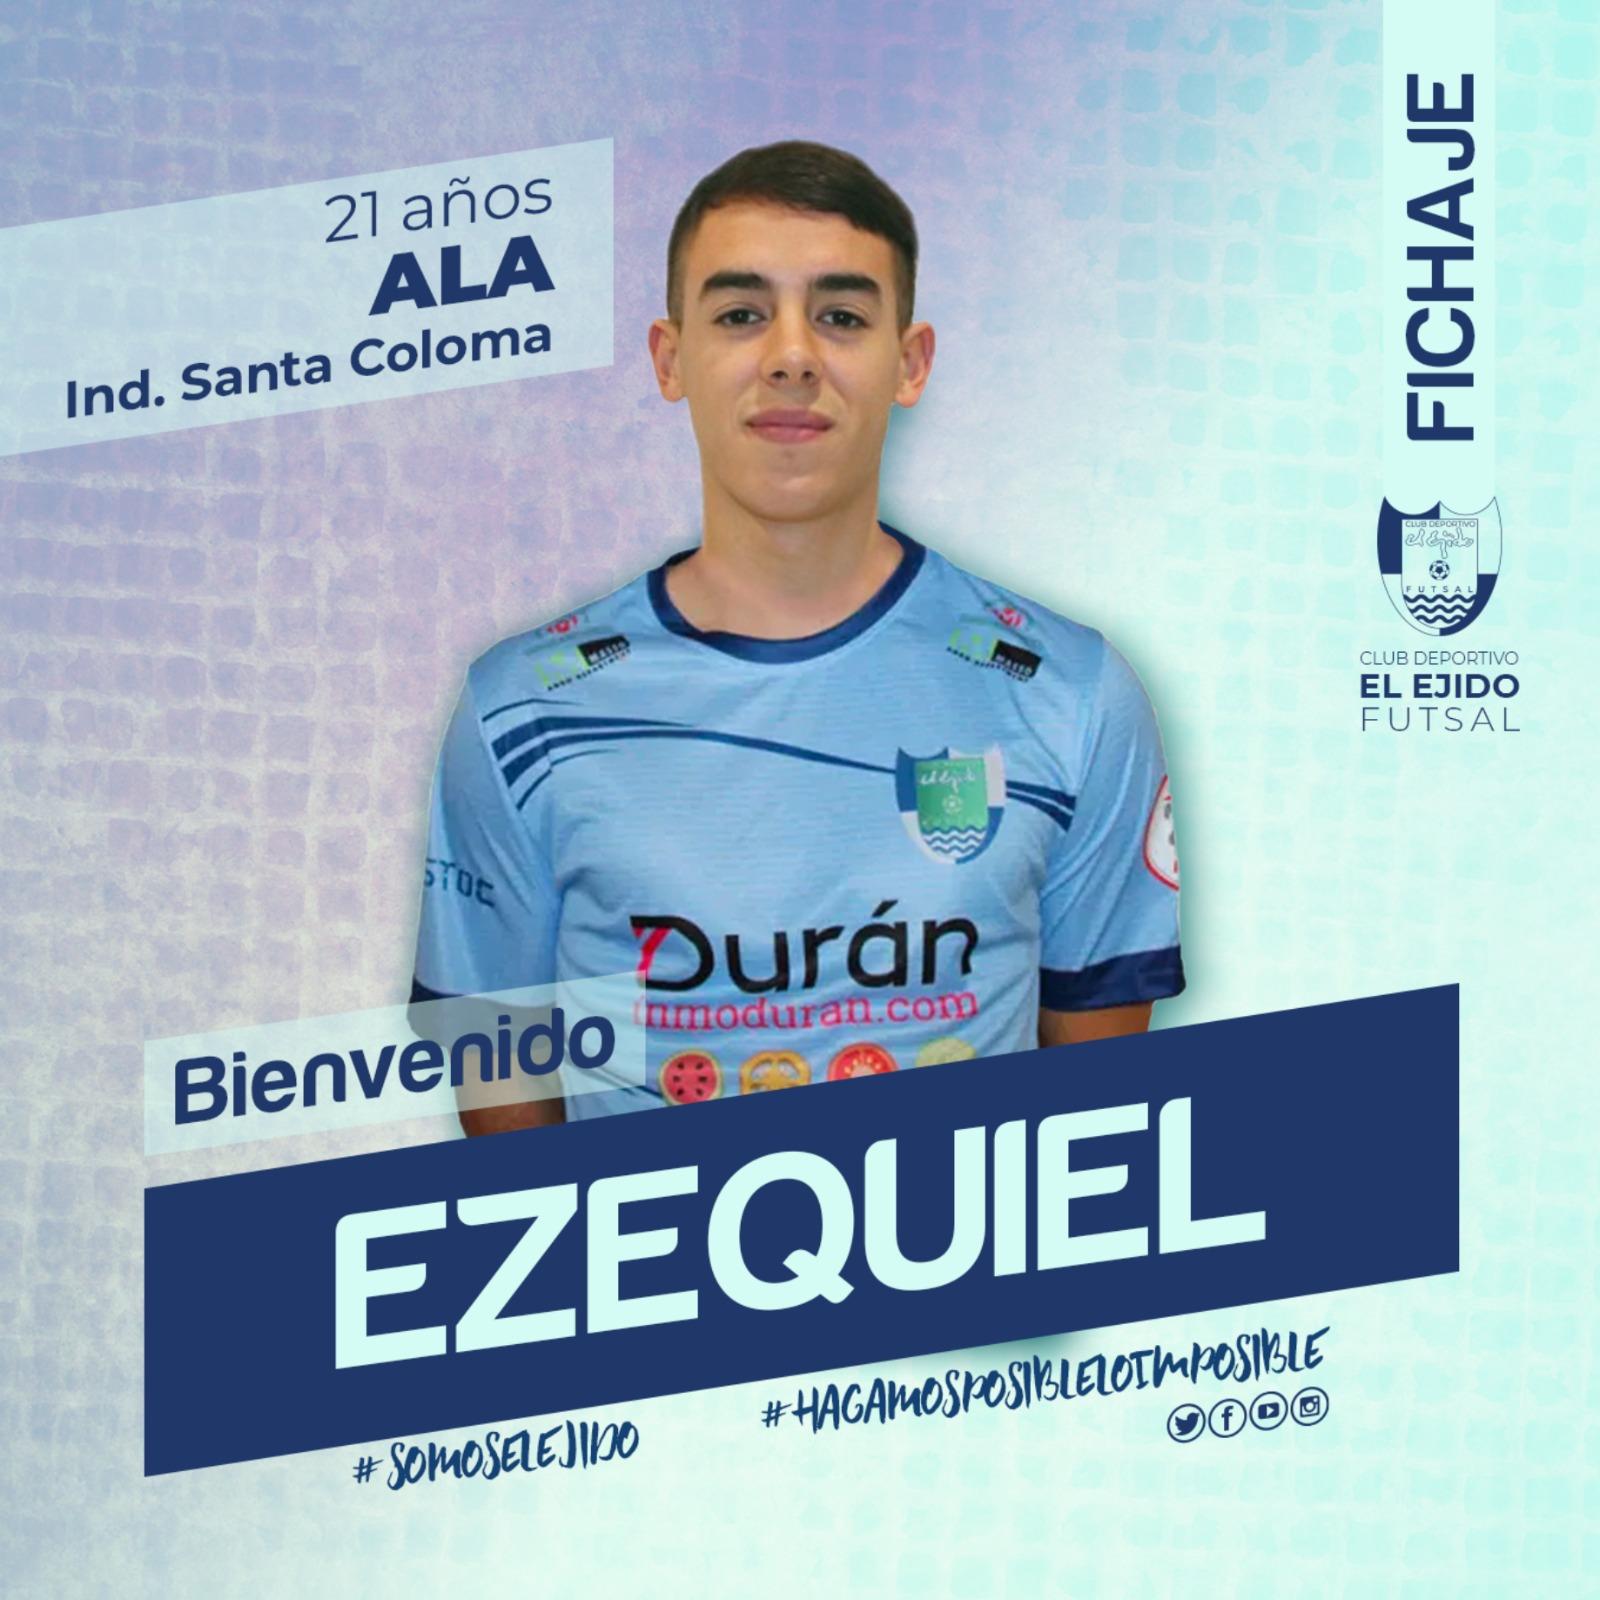 El ala Ezequiel Ramírez se une a la familia del CD Ejido Futsal